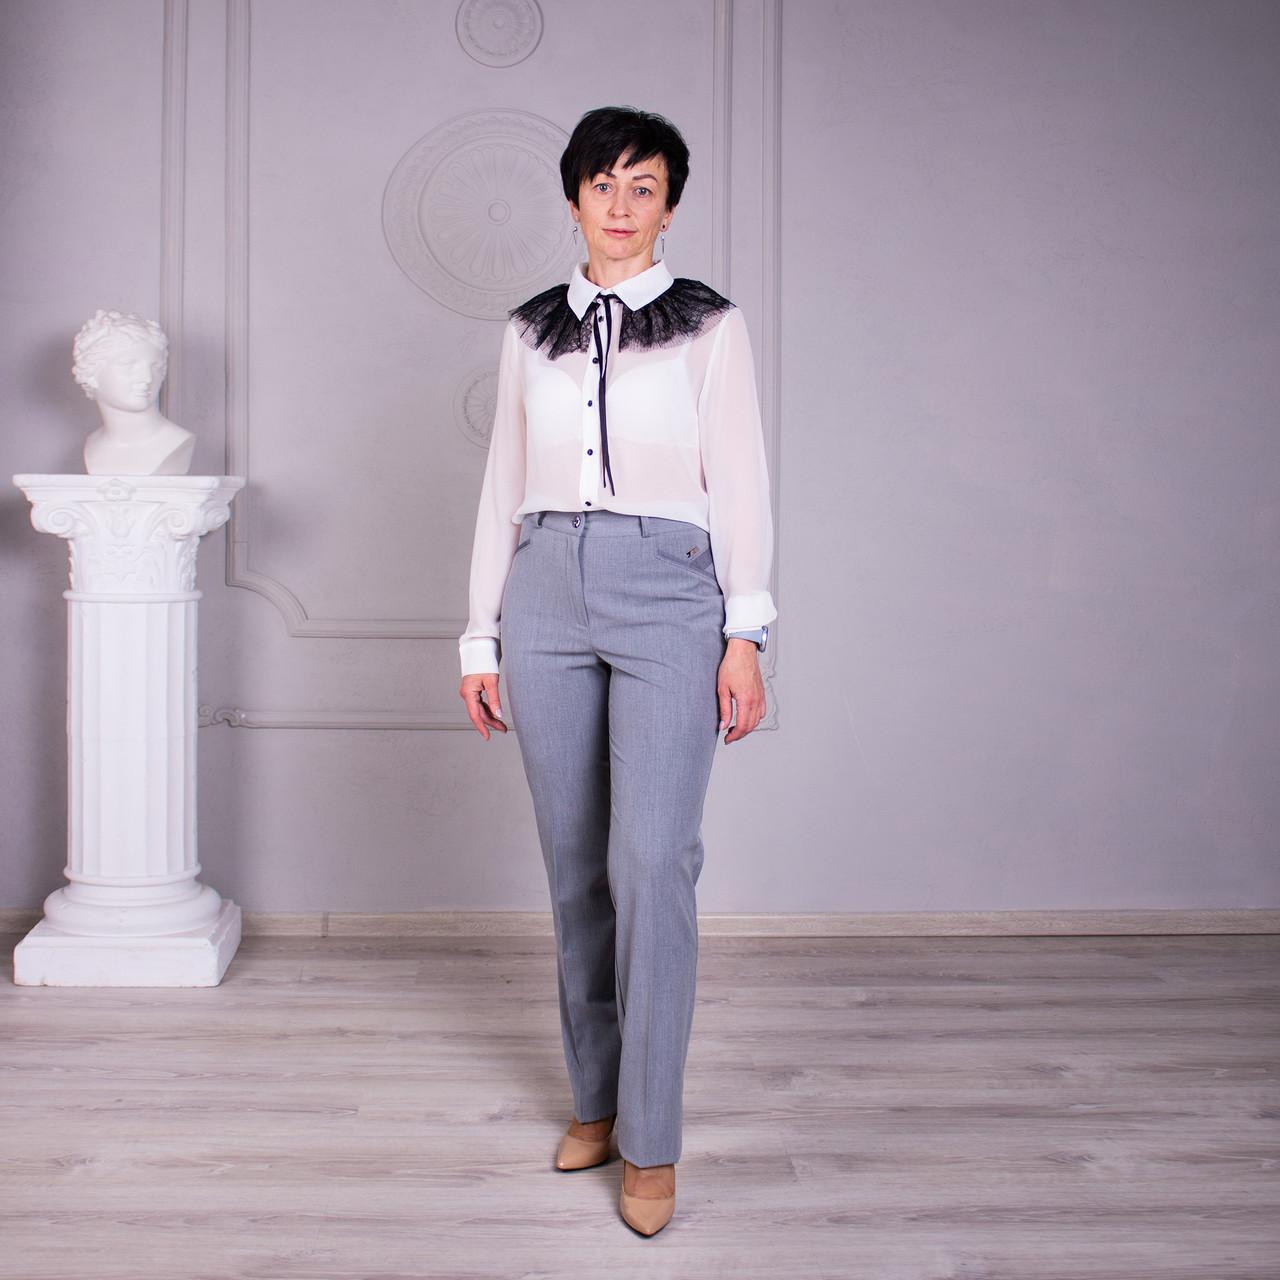 Женские брюки Дороти цвет беж, серый размер 46- 60